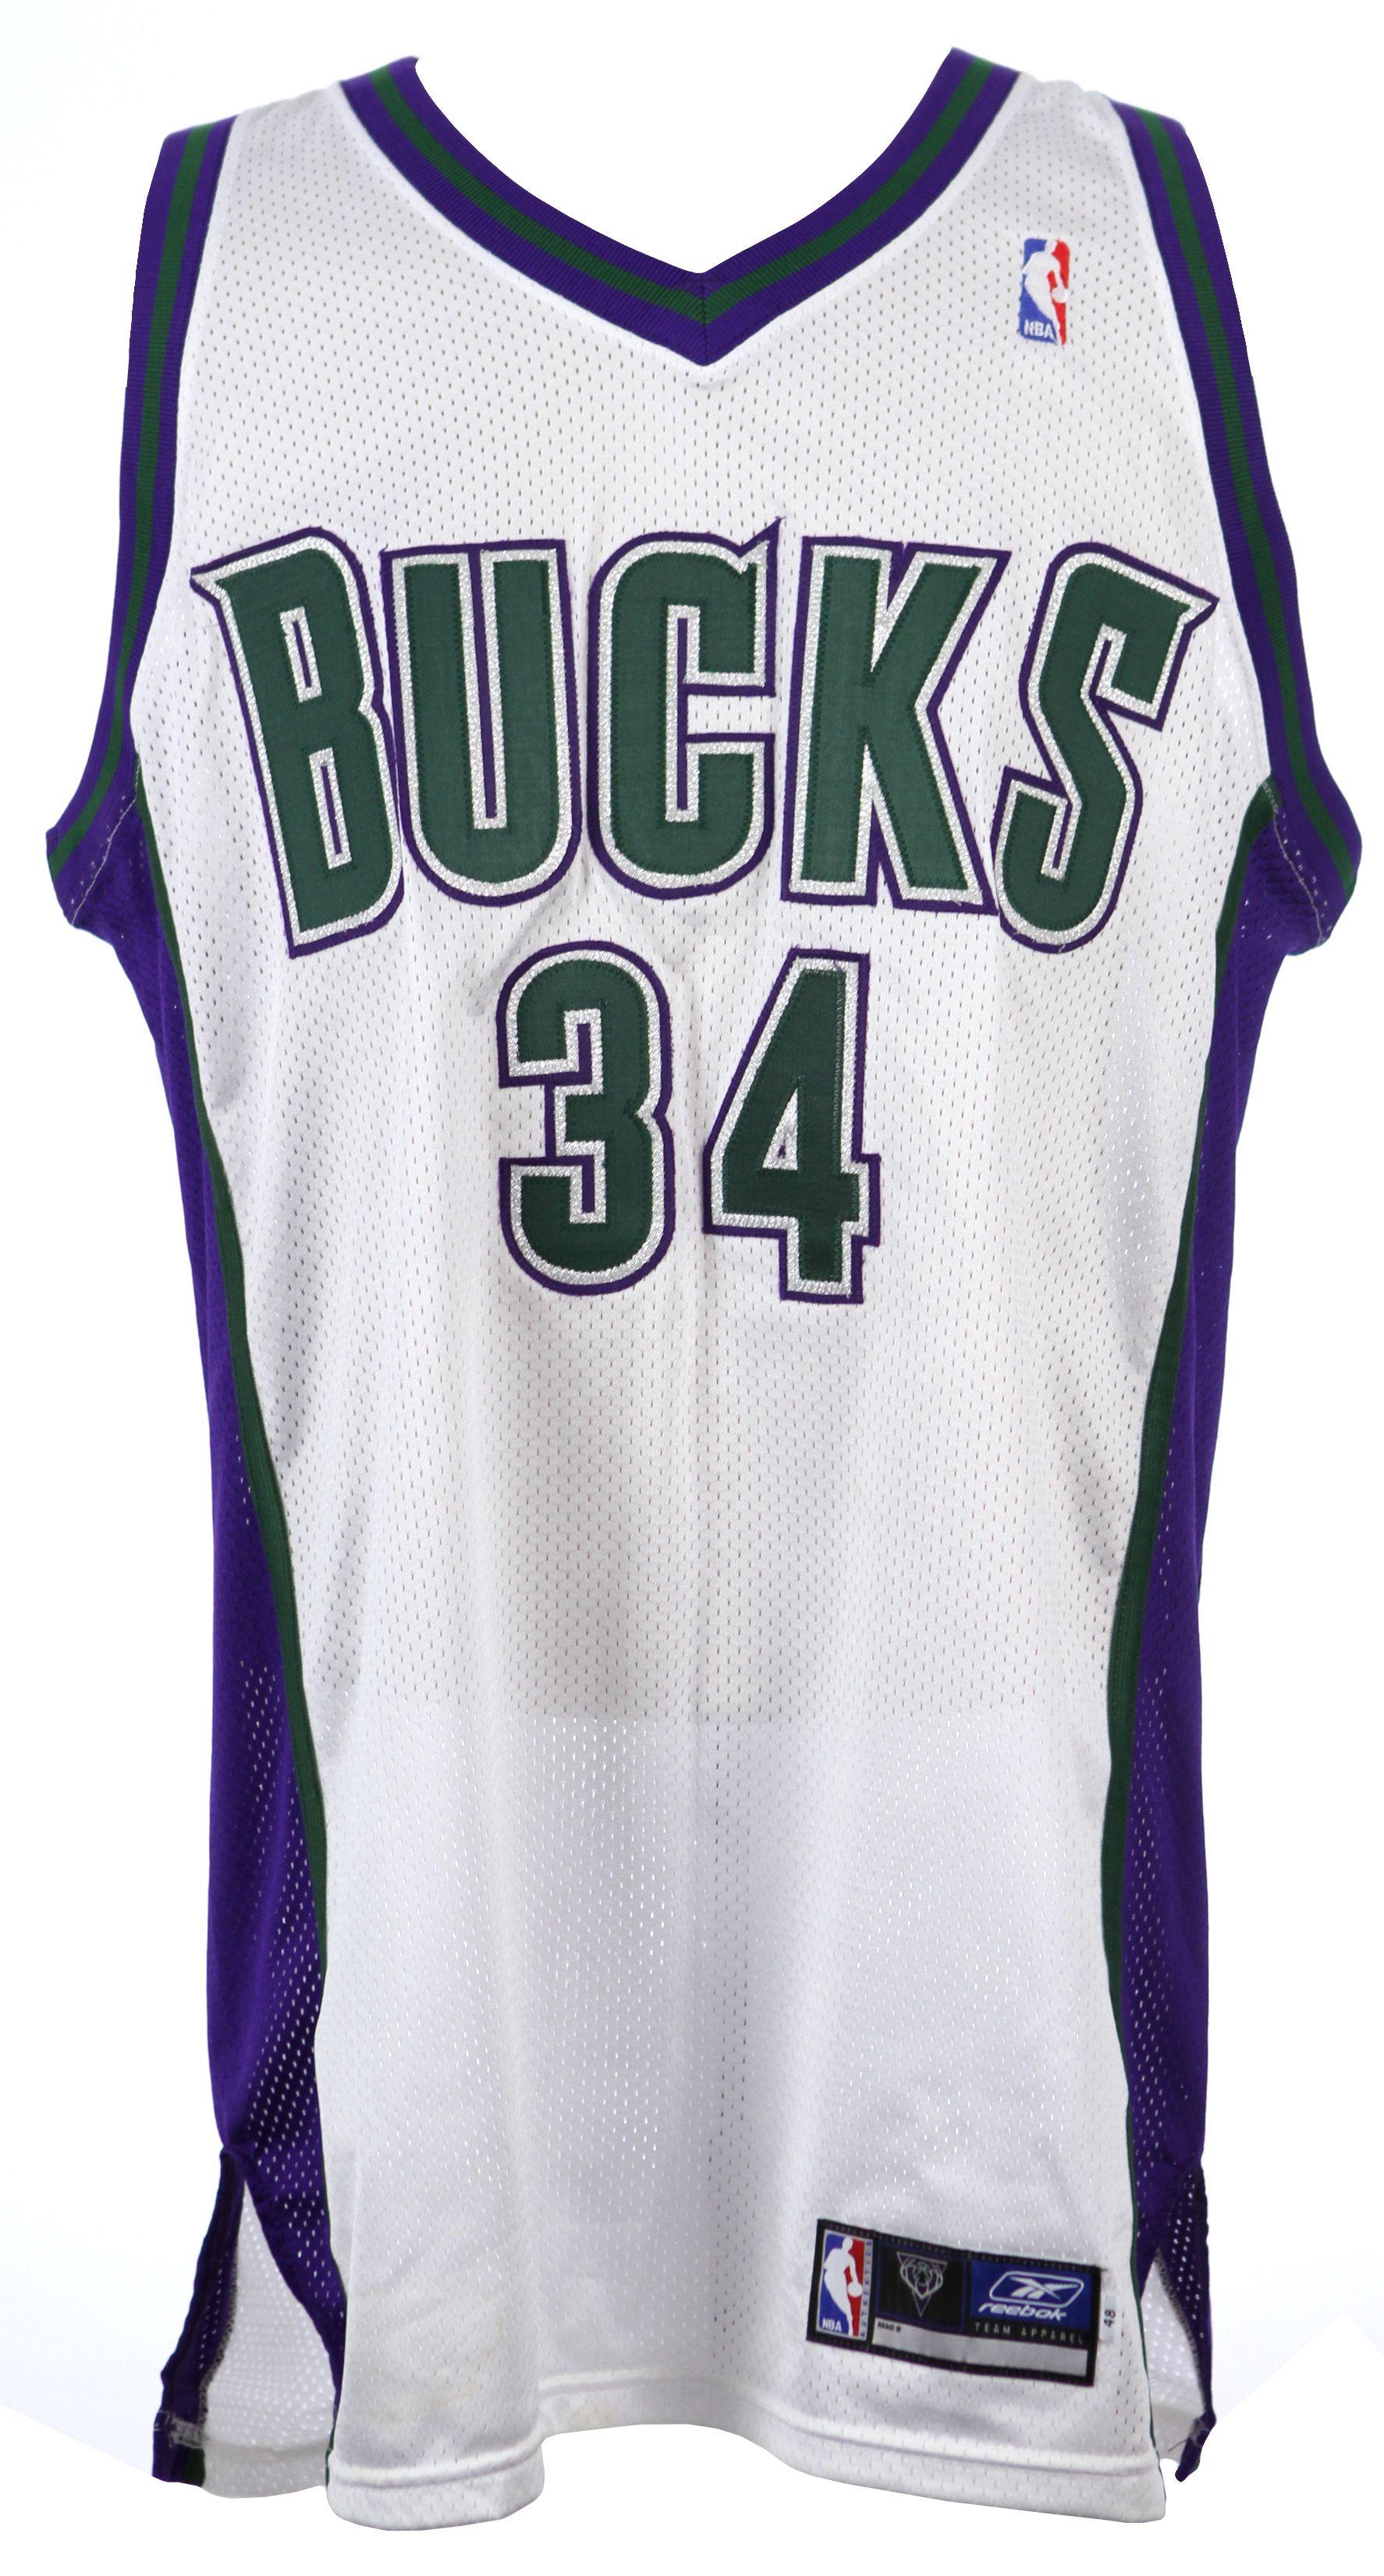 ray allen bucks jersey